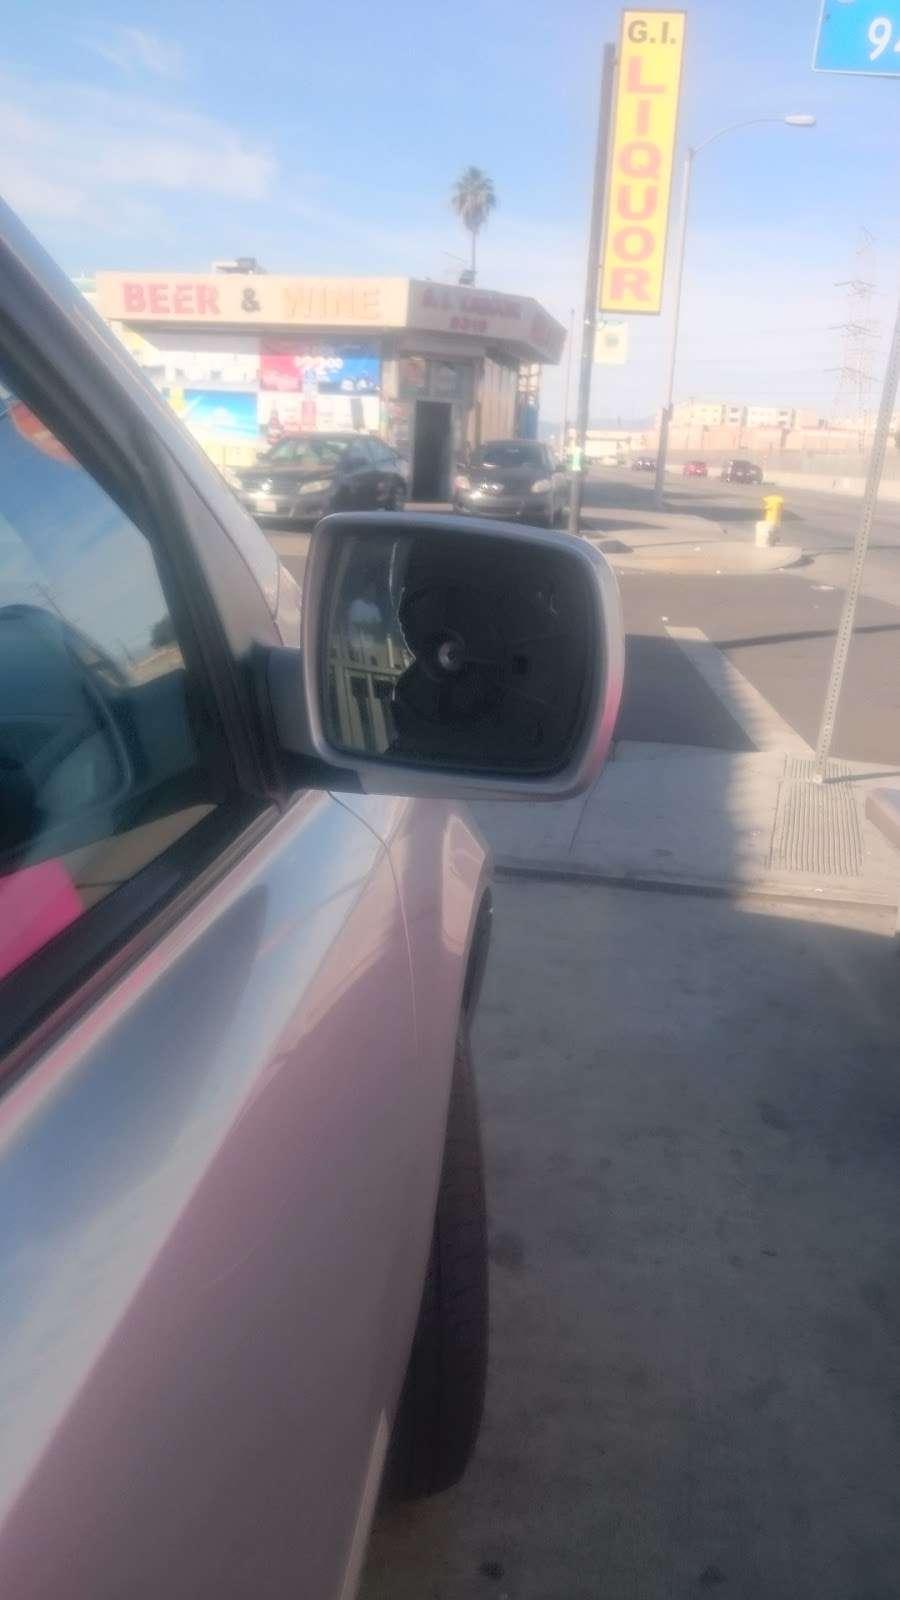 Michoacan Auto Glass - car repair  | Photo 8 of 9 | Address: 9405 Alameda St, Los Angeles, CA 90002, USA | Phone: (323) 567-1662